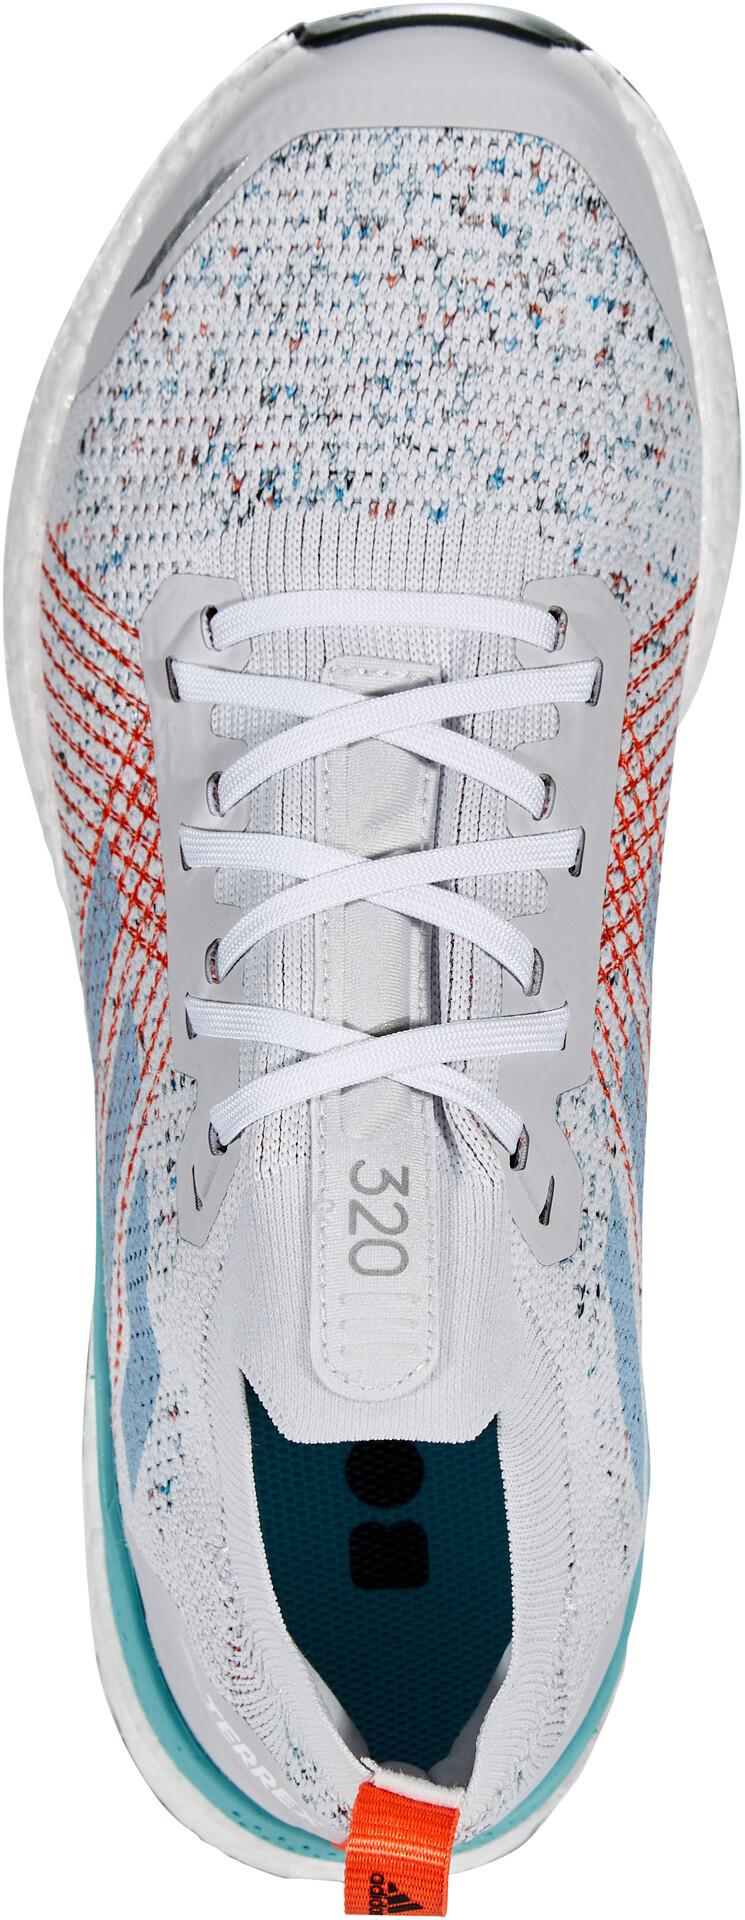 adidas Terrex Herren Terrex Two Ultra Parley Schuhe kaufen